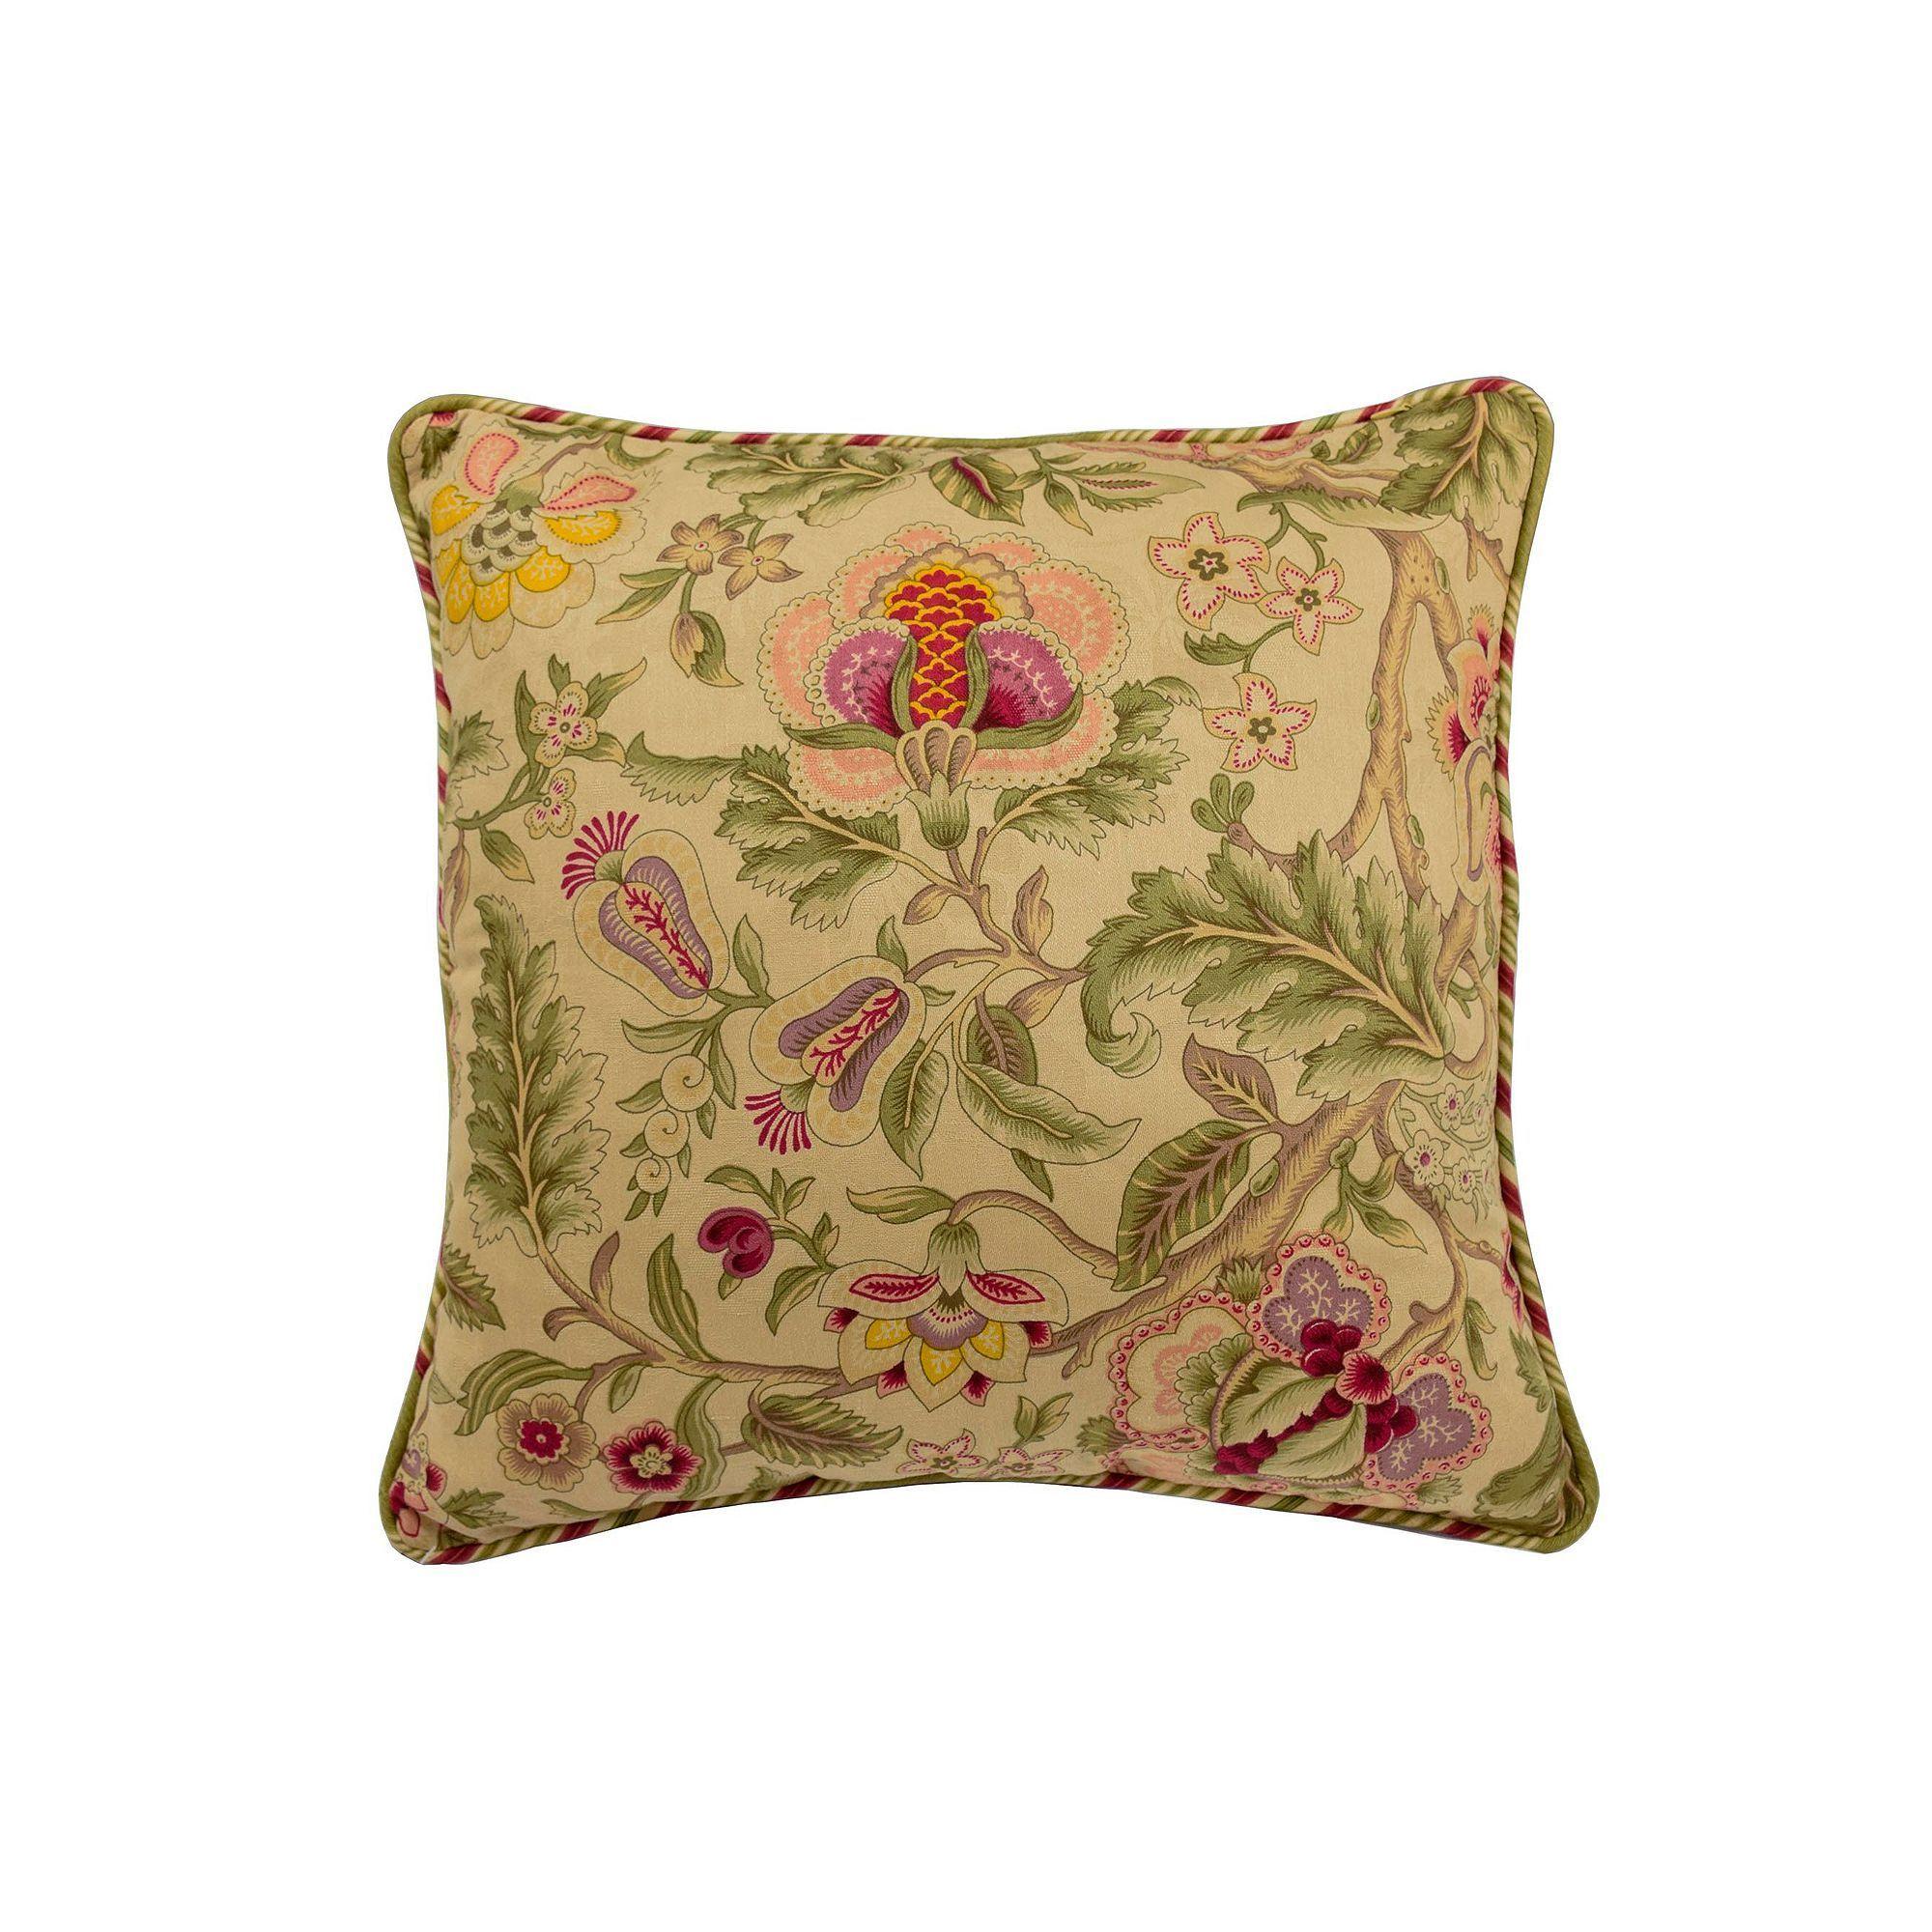 Waverly Imperial Dress Jacobean Floral Throw Pillow Floral Throw Pillows Decorative Pillows White Decorative Pillows